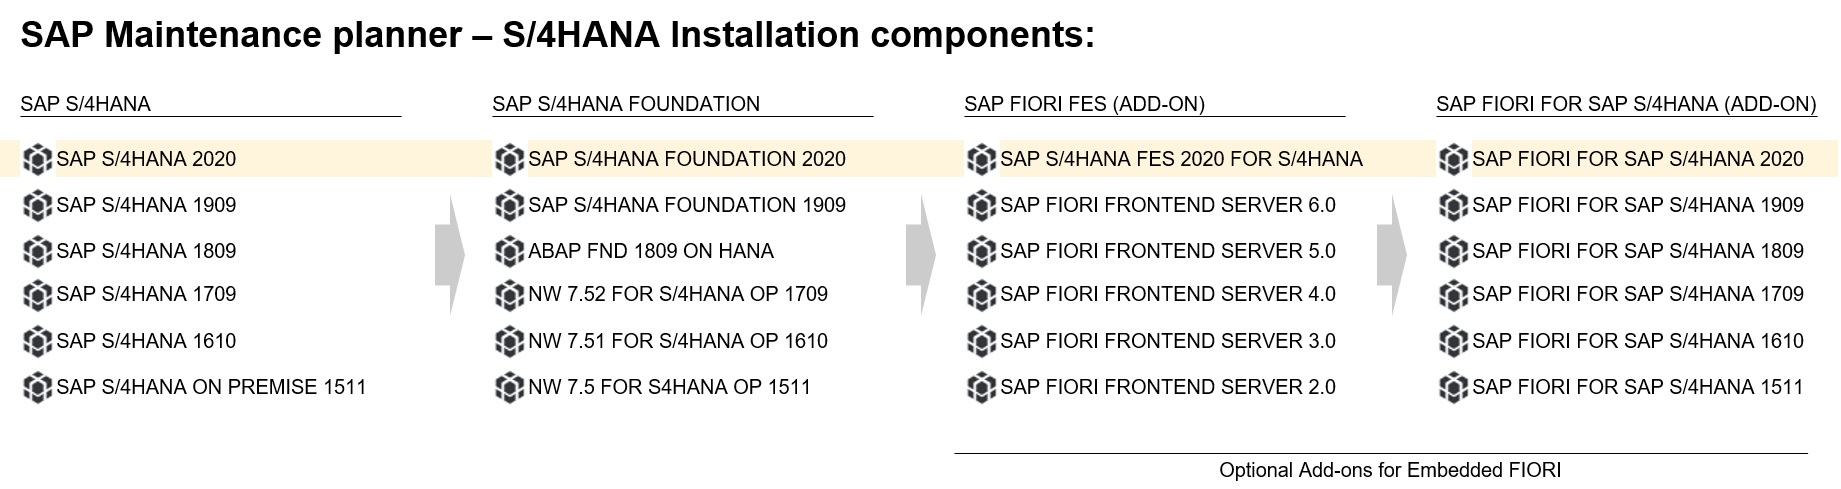 Maintenance%20Planner%20-%20S4HANA%202020